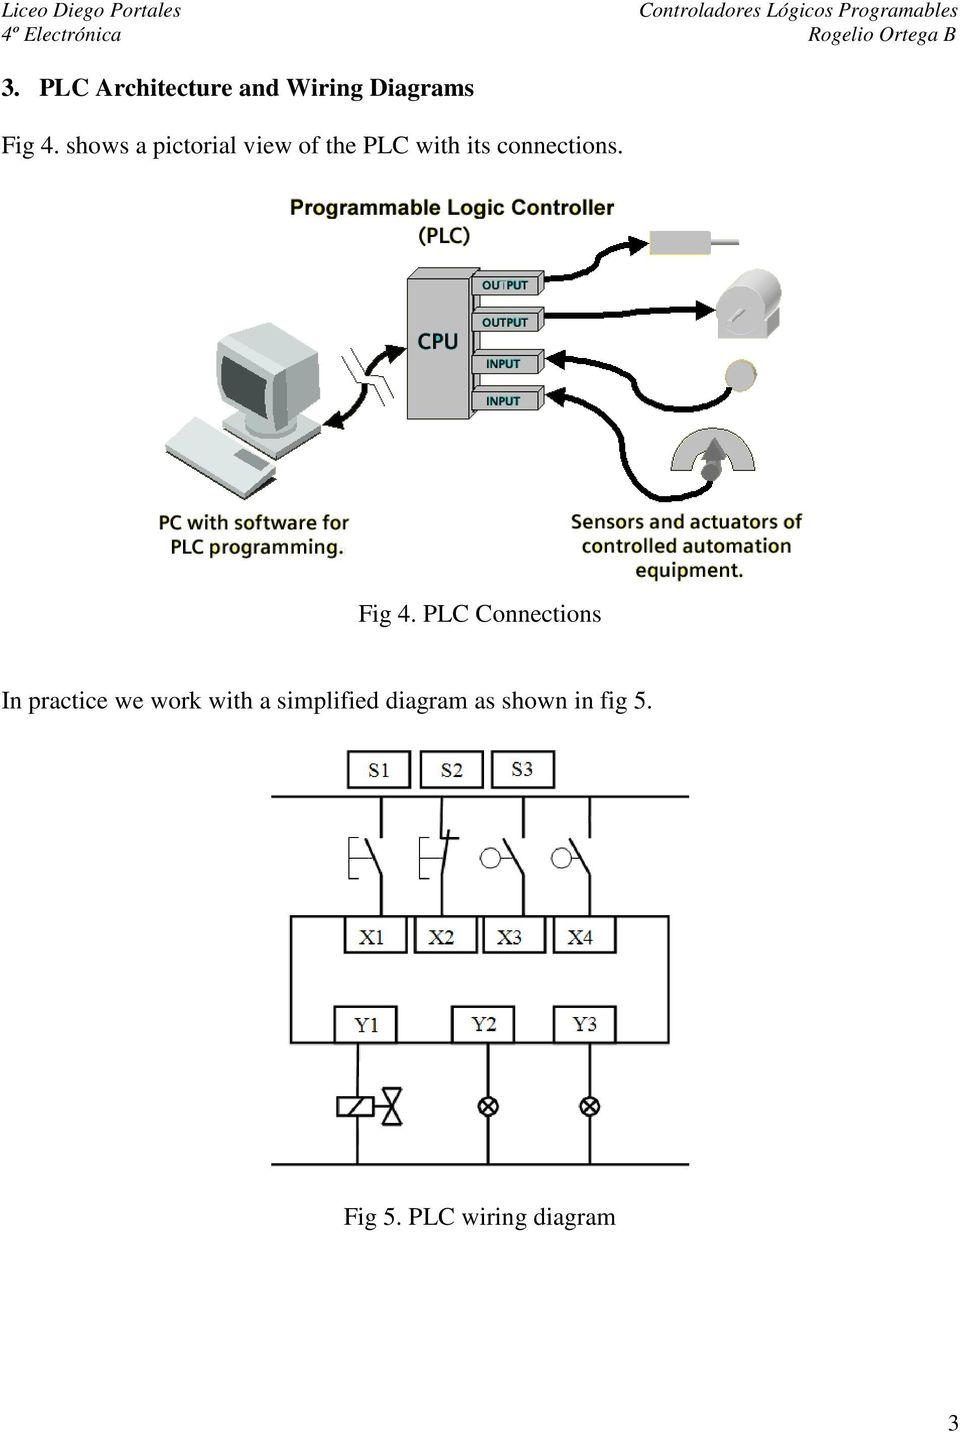 medium resolution of plc wiring diagram 3 fig 4